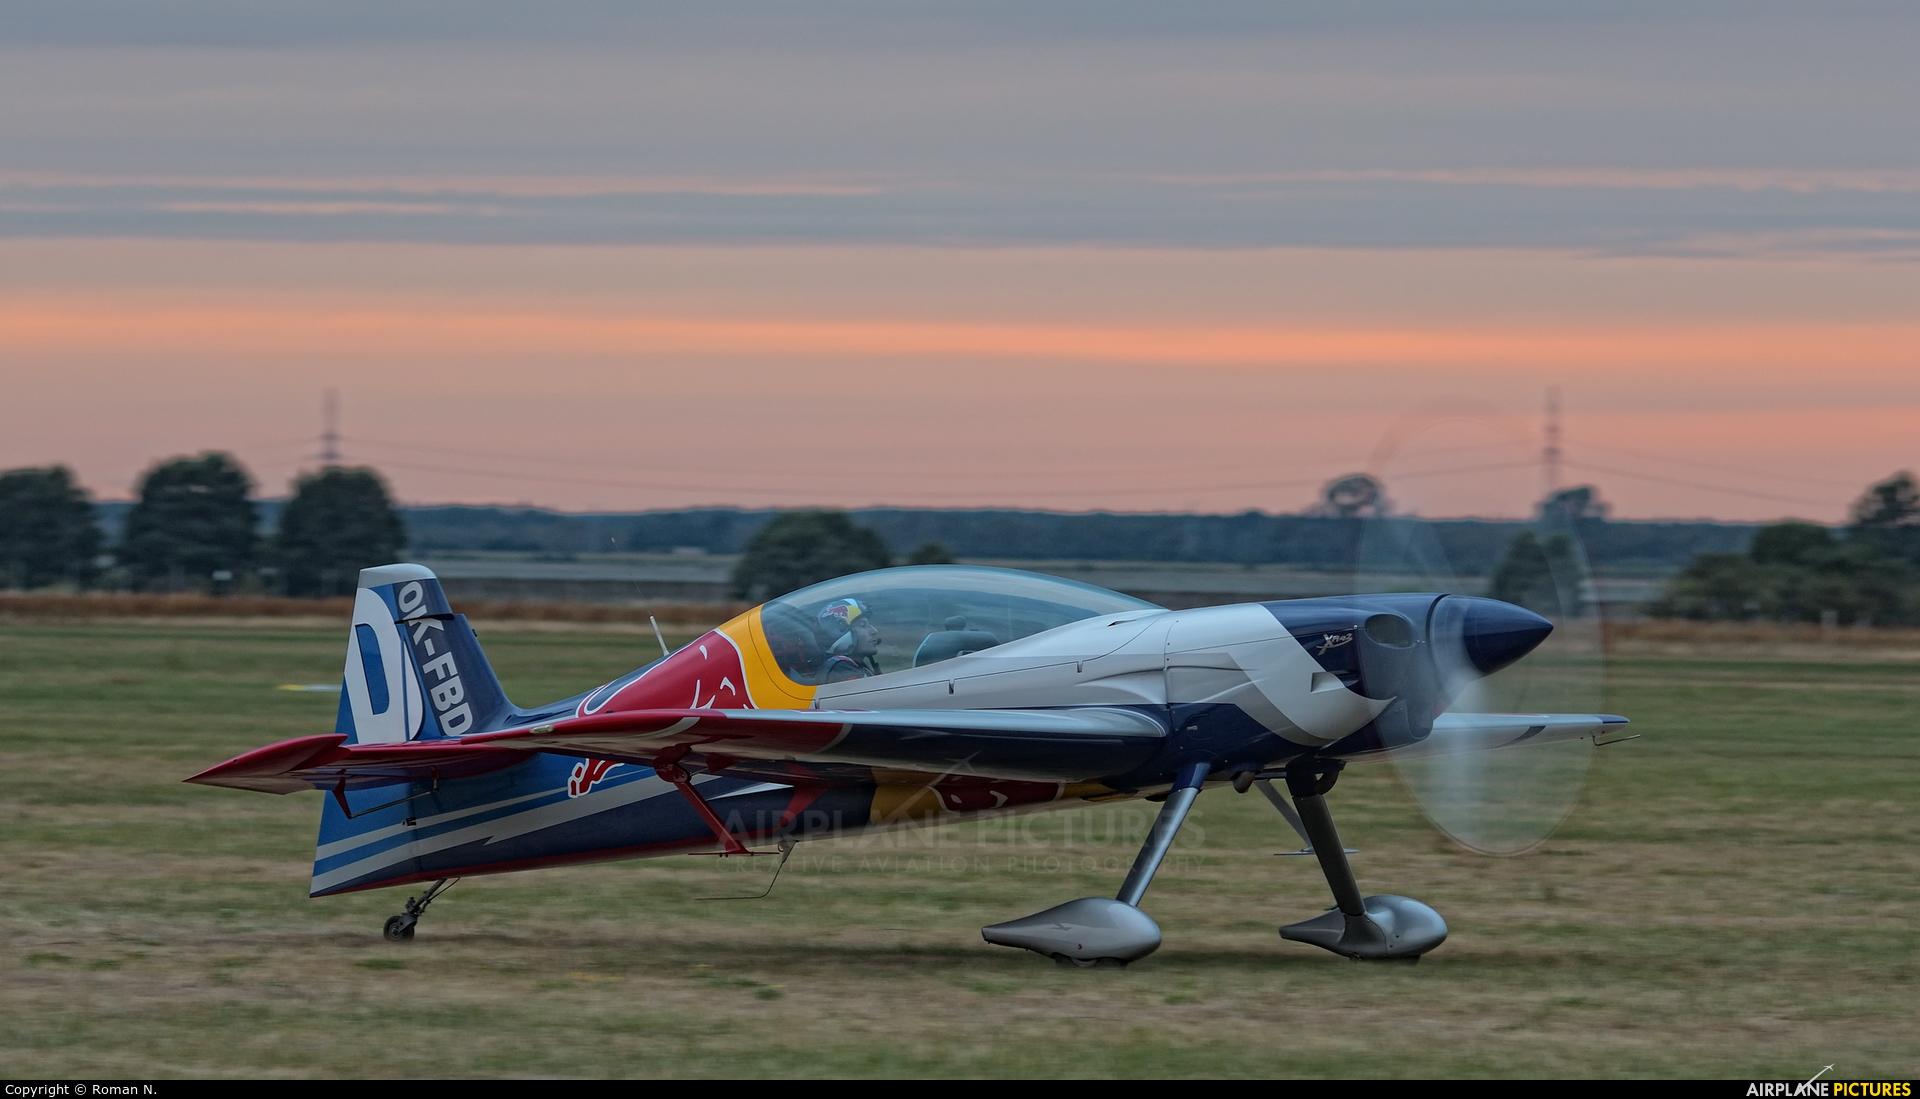 The Flying Bulls Duo : Aerobatics Team OK-FBD aircraft at Leszno - Strzyżewice